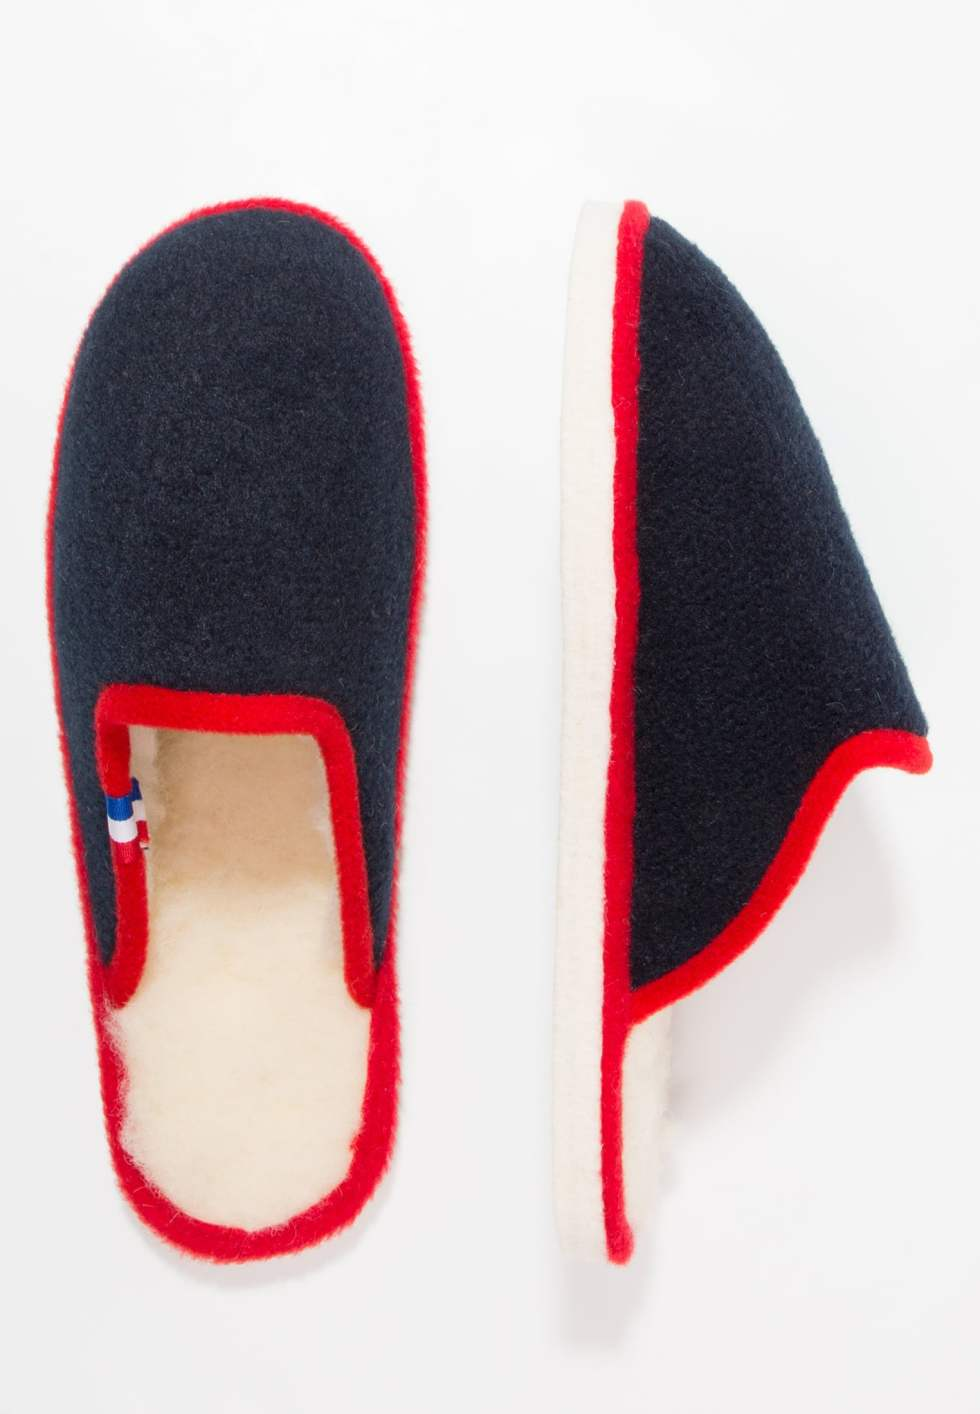 Zalando slippers